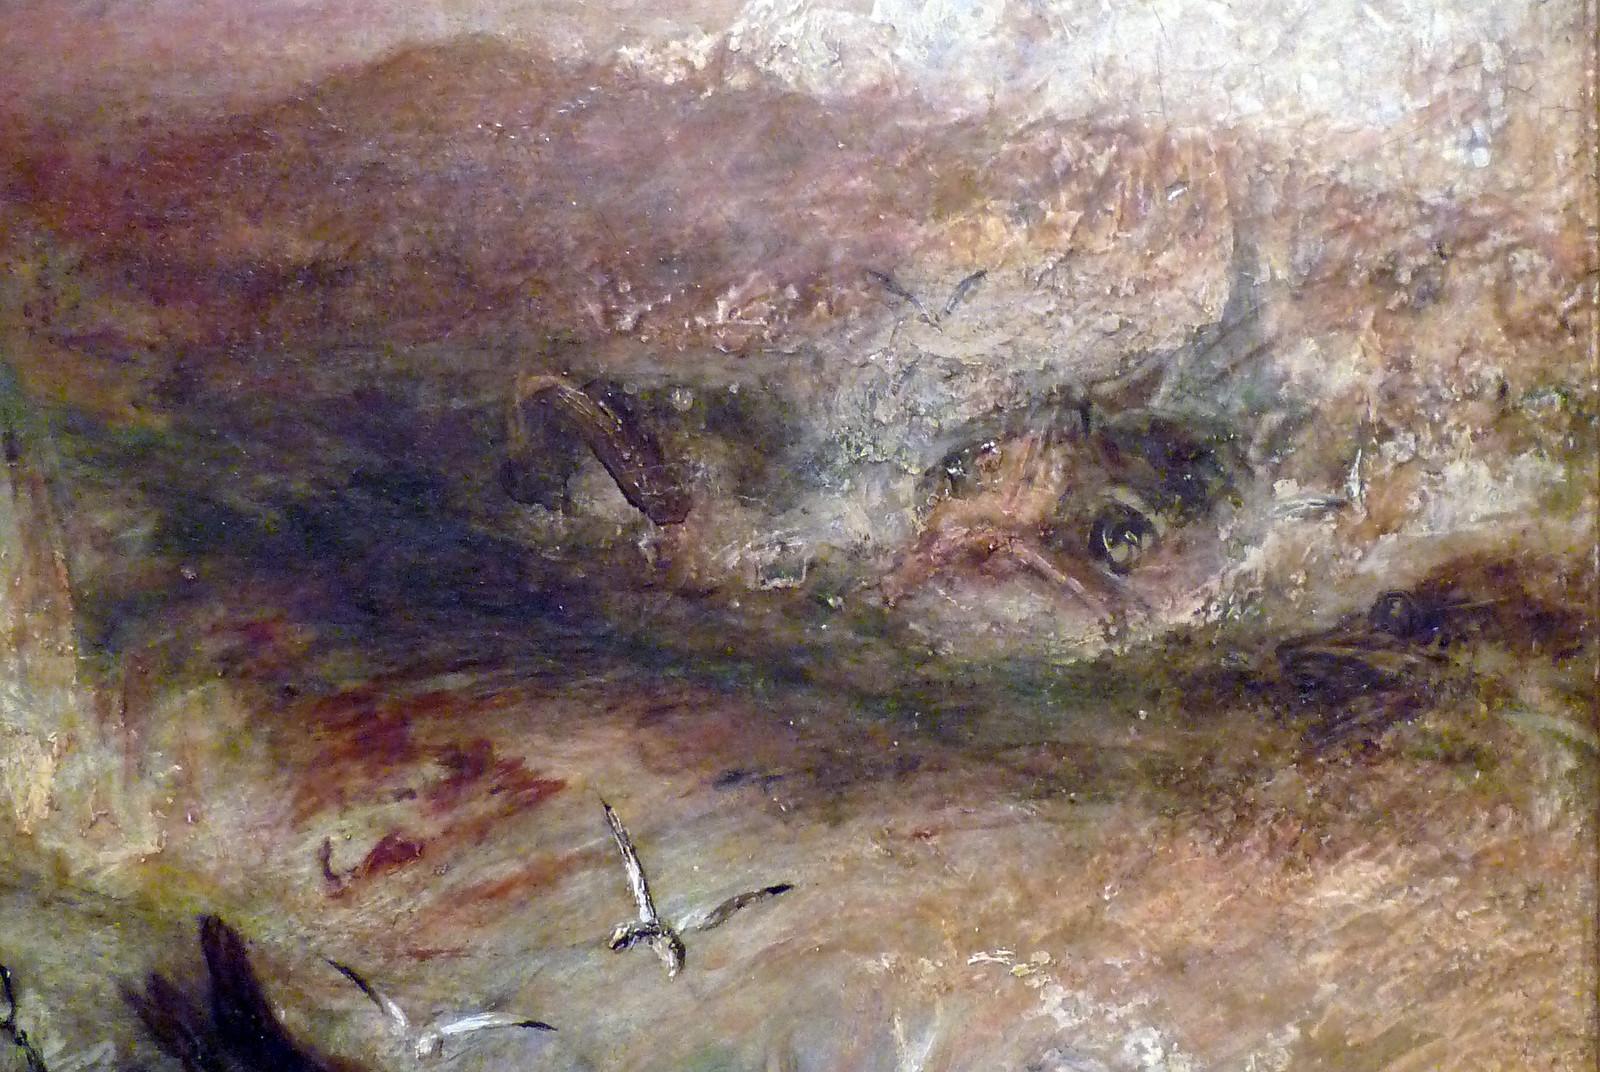 JMW Turner, Slave Ship, detail with shark | by profzucker